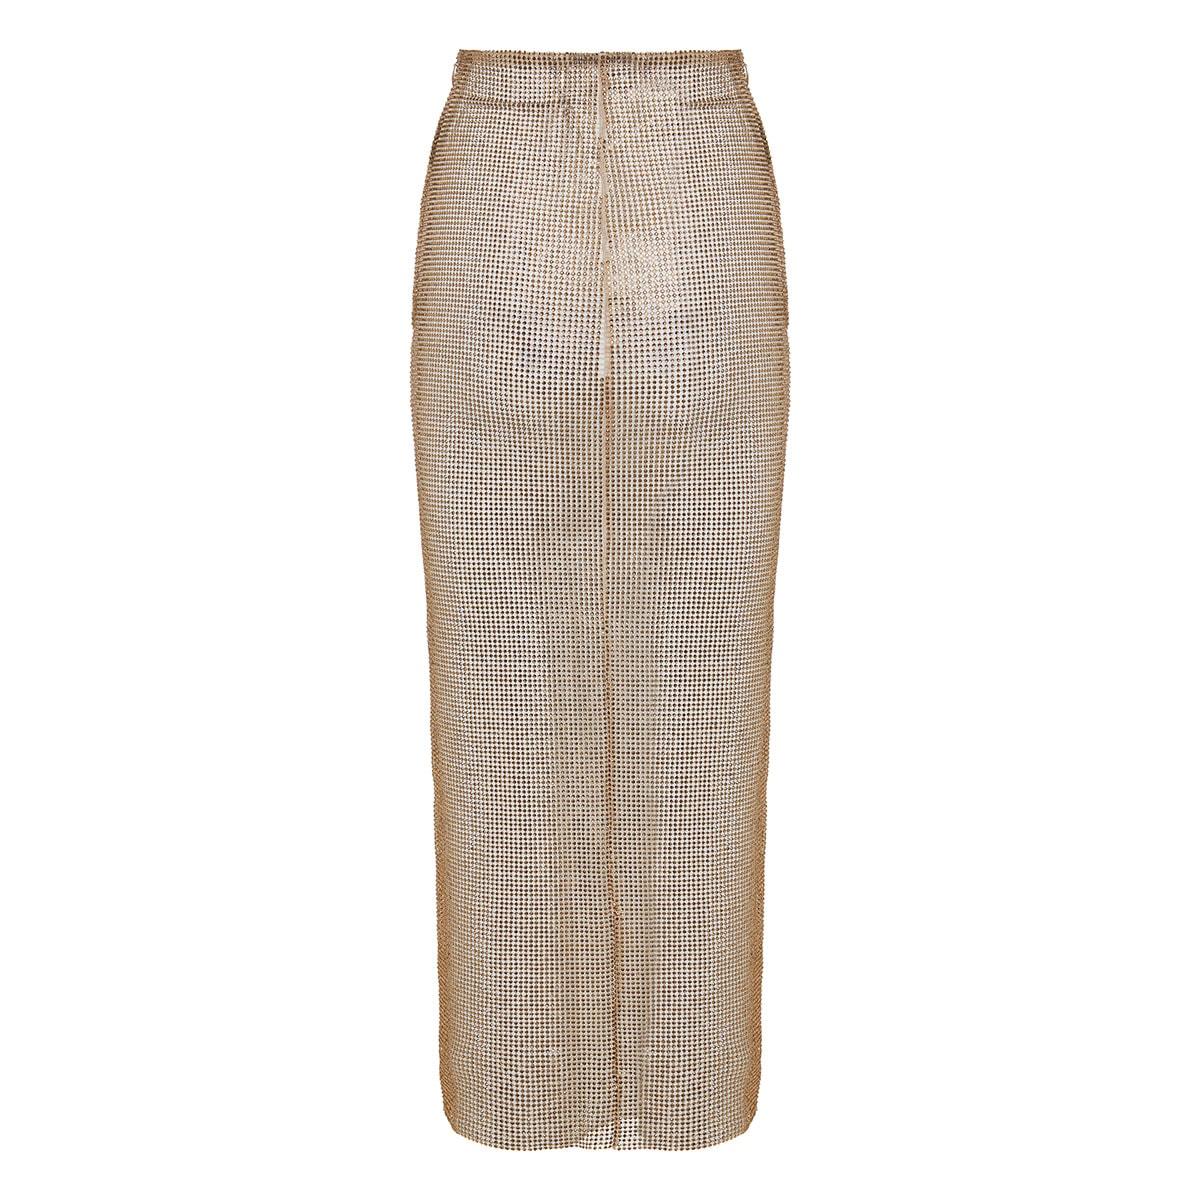 Crystal-mesh pencil skirt